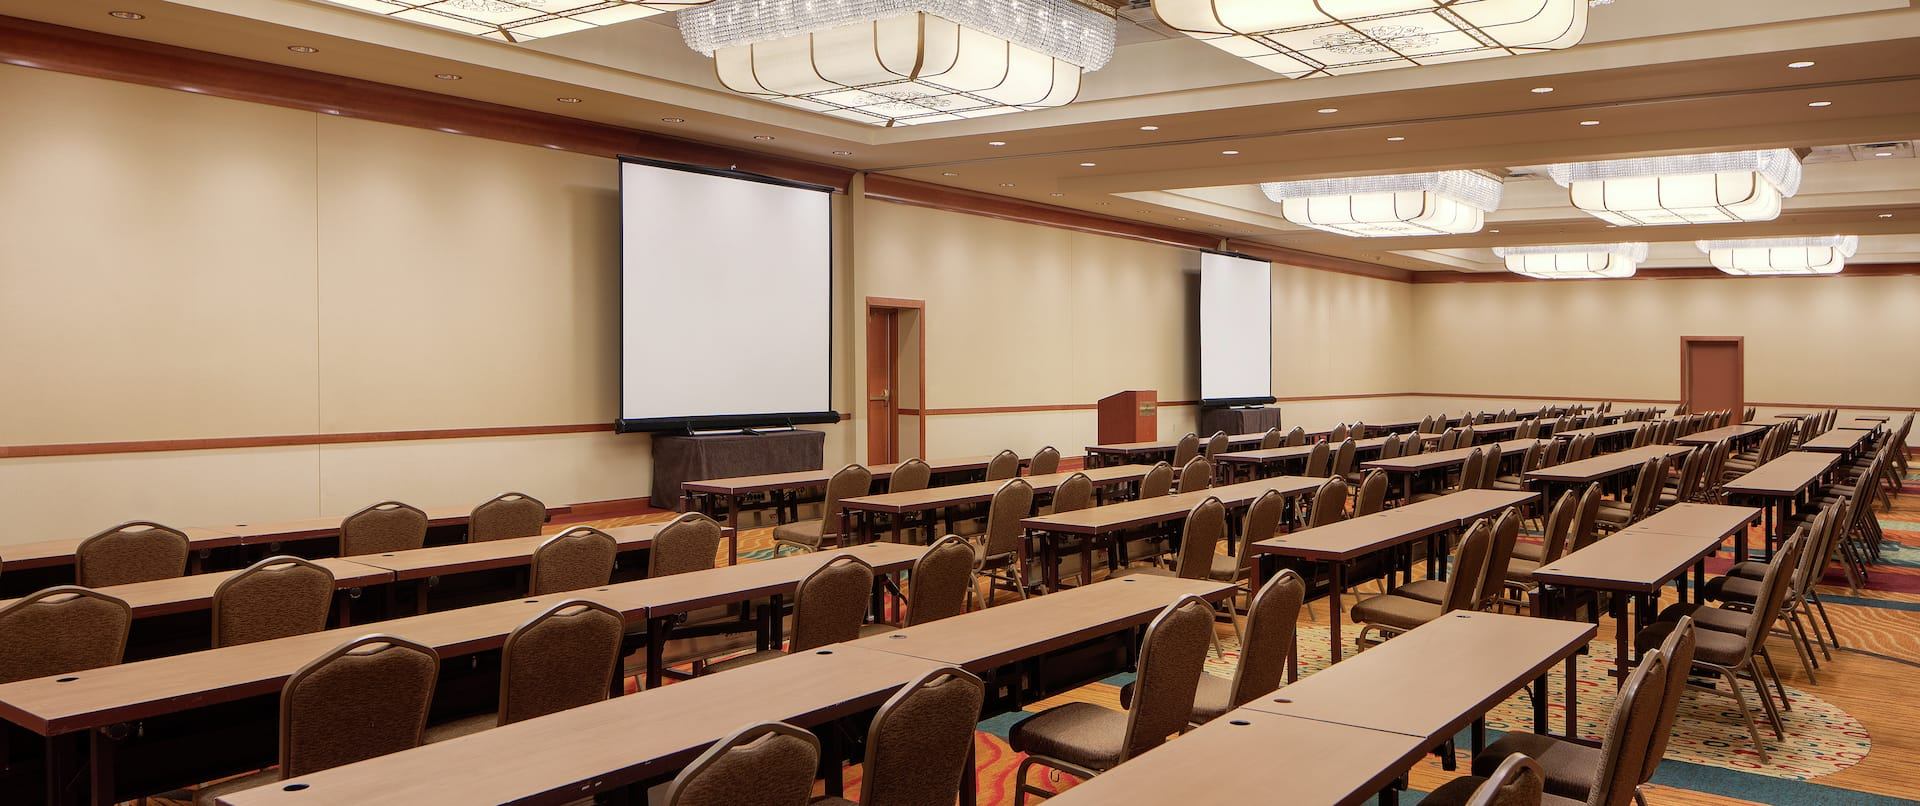 Classroom Style Set up Ballroom